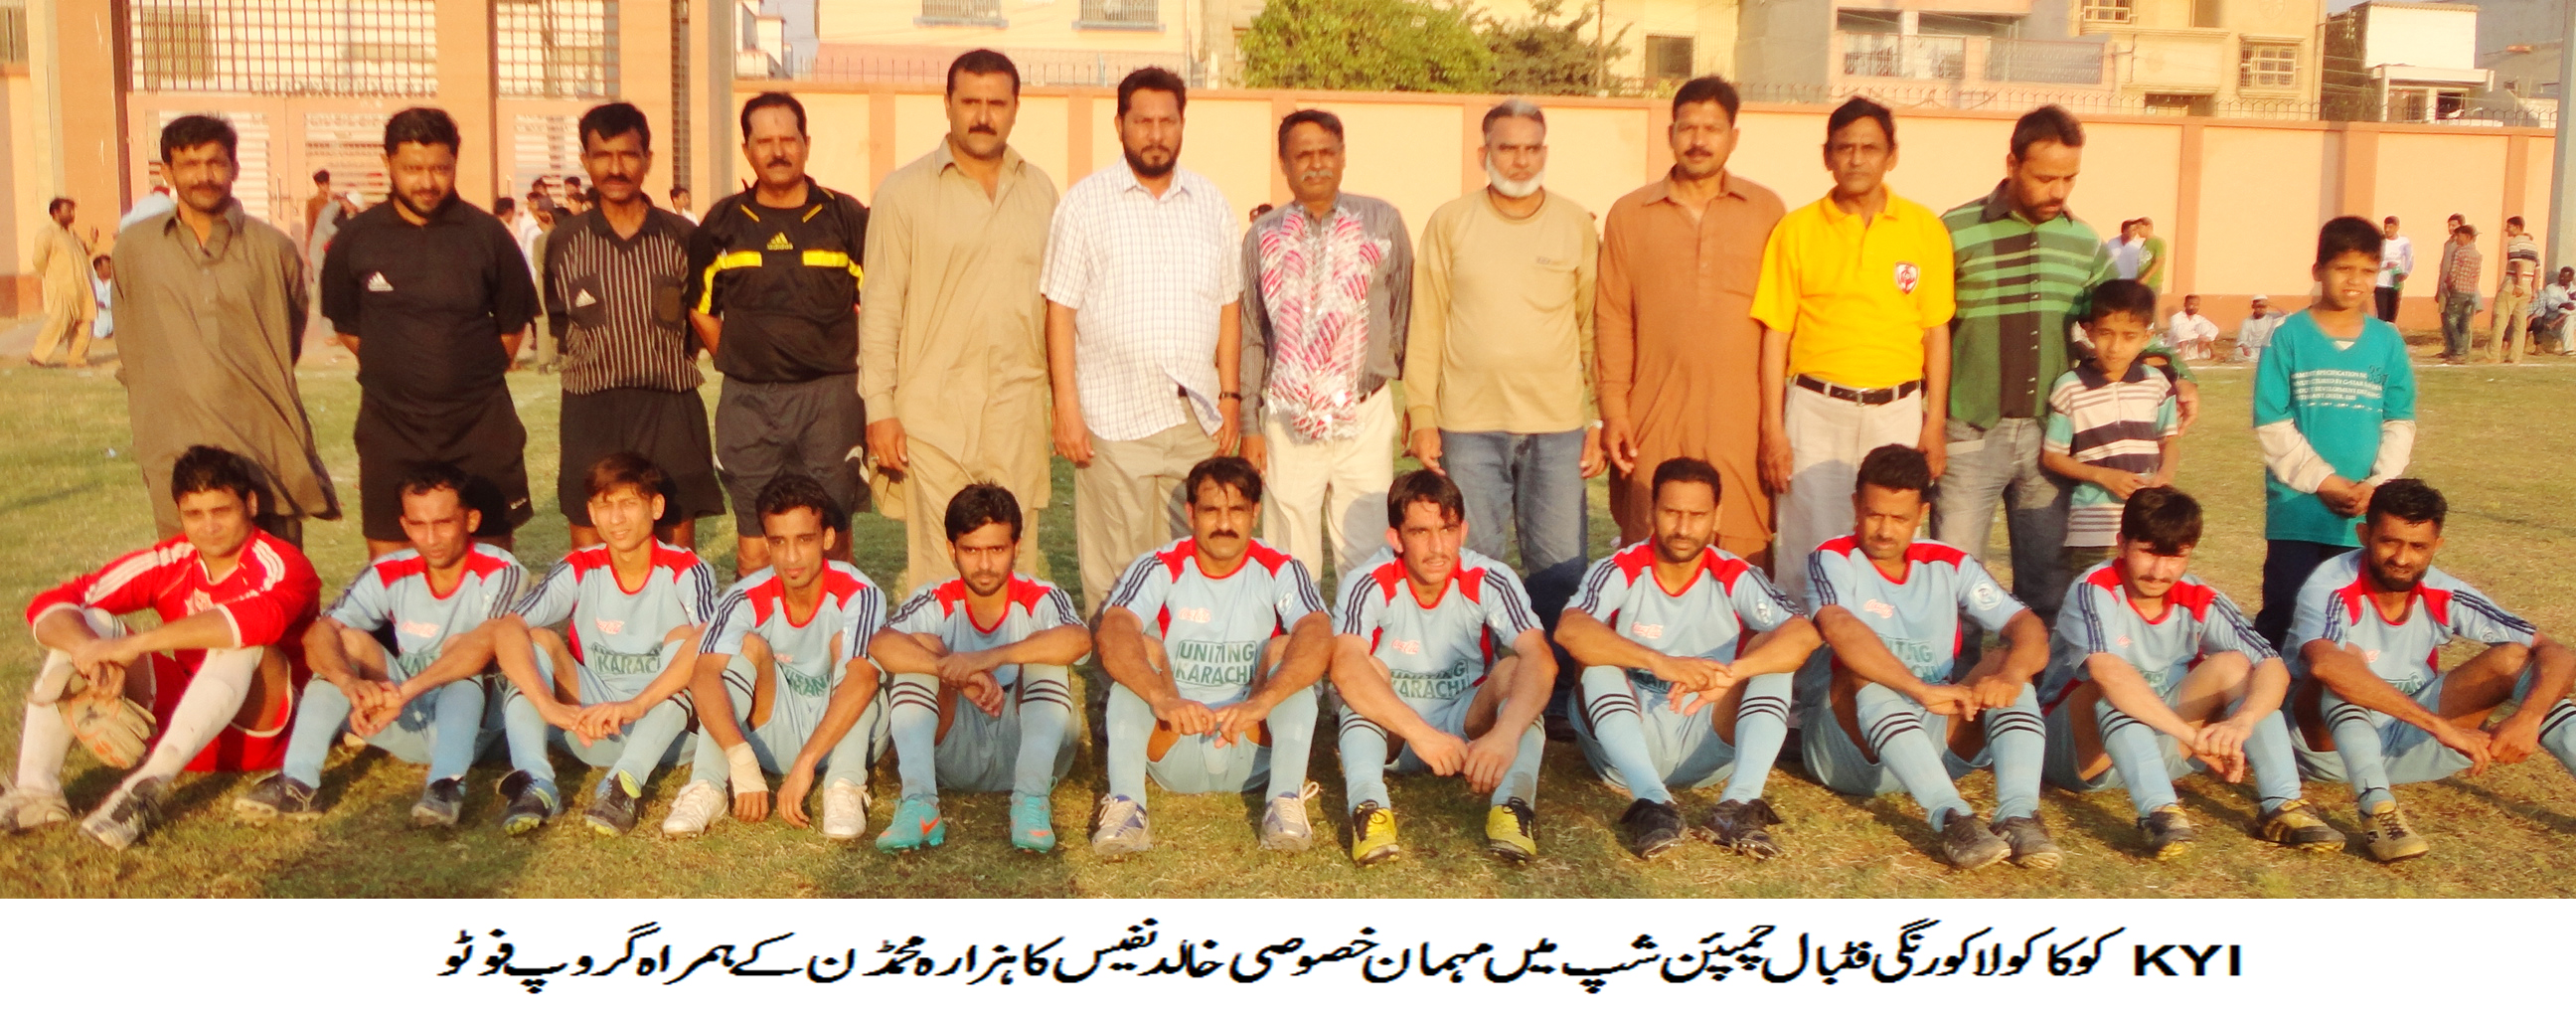 Hazara Mohammedan qualified for Korangi Championship Final